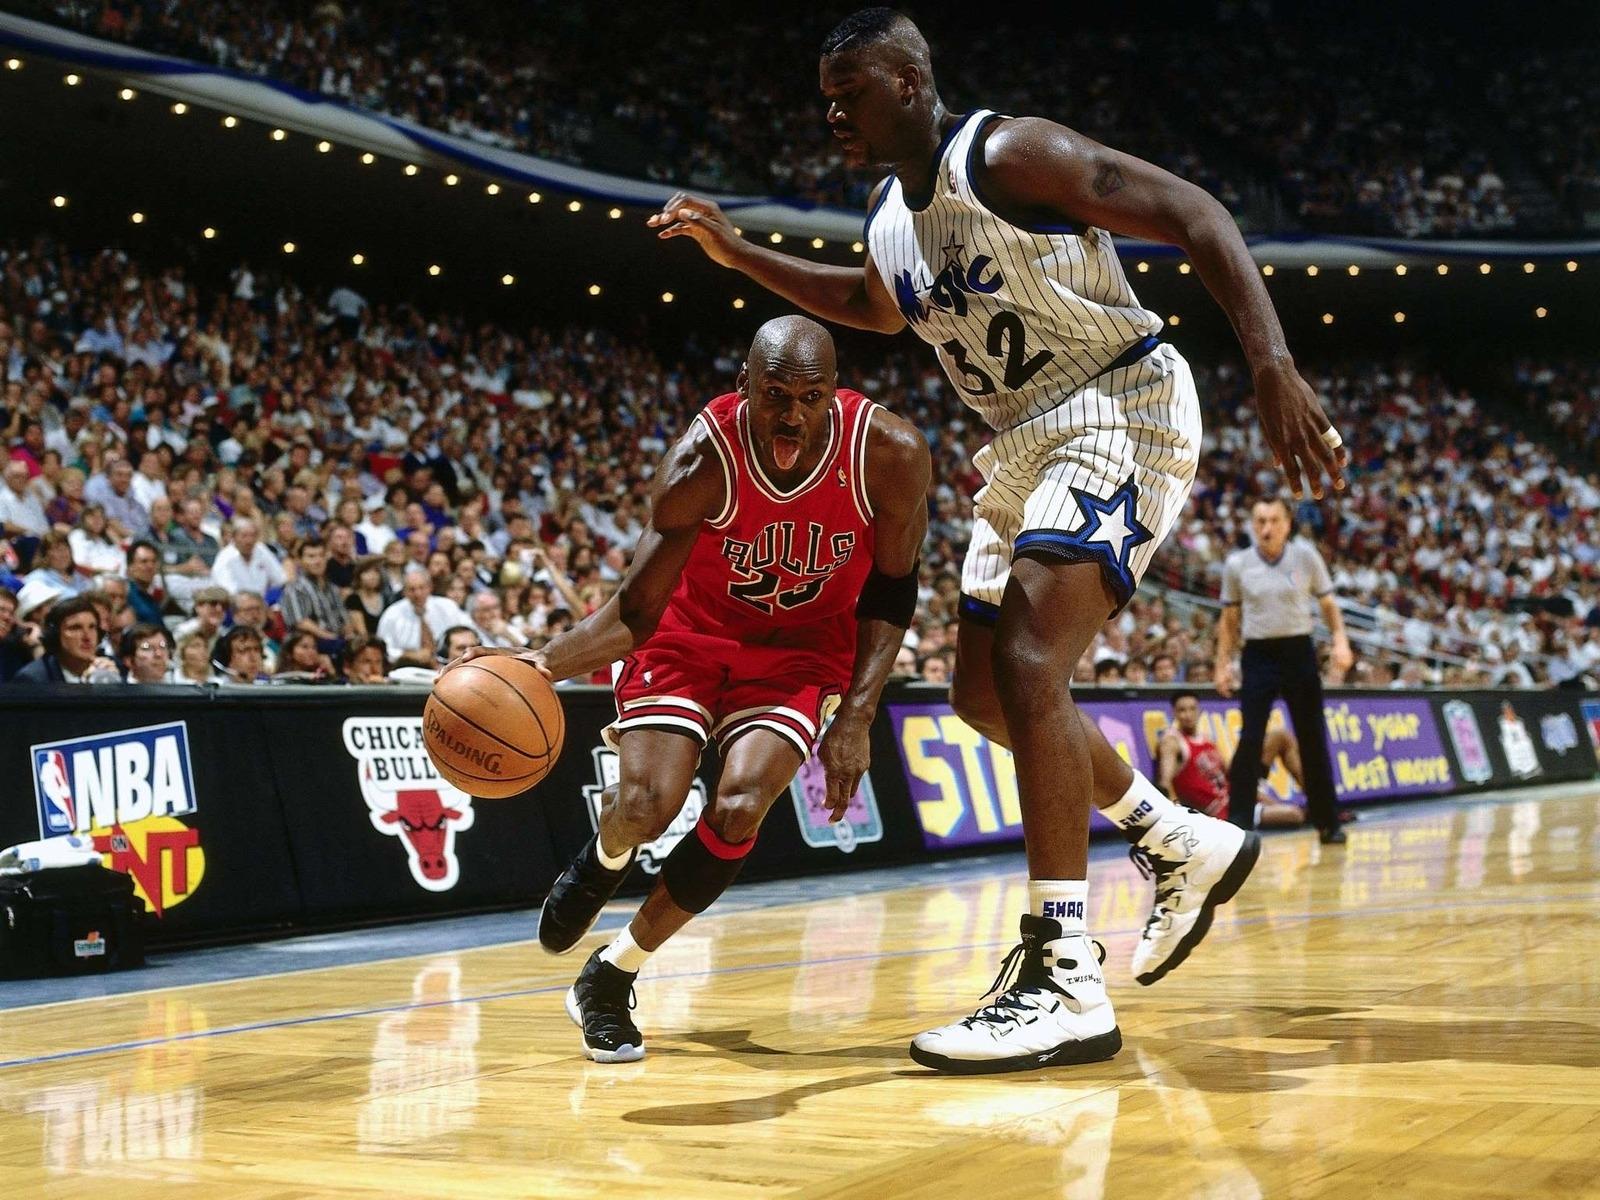 basketball wallpapers hd durantula basketball wallpapers hd basketball 1600x1200